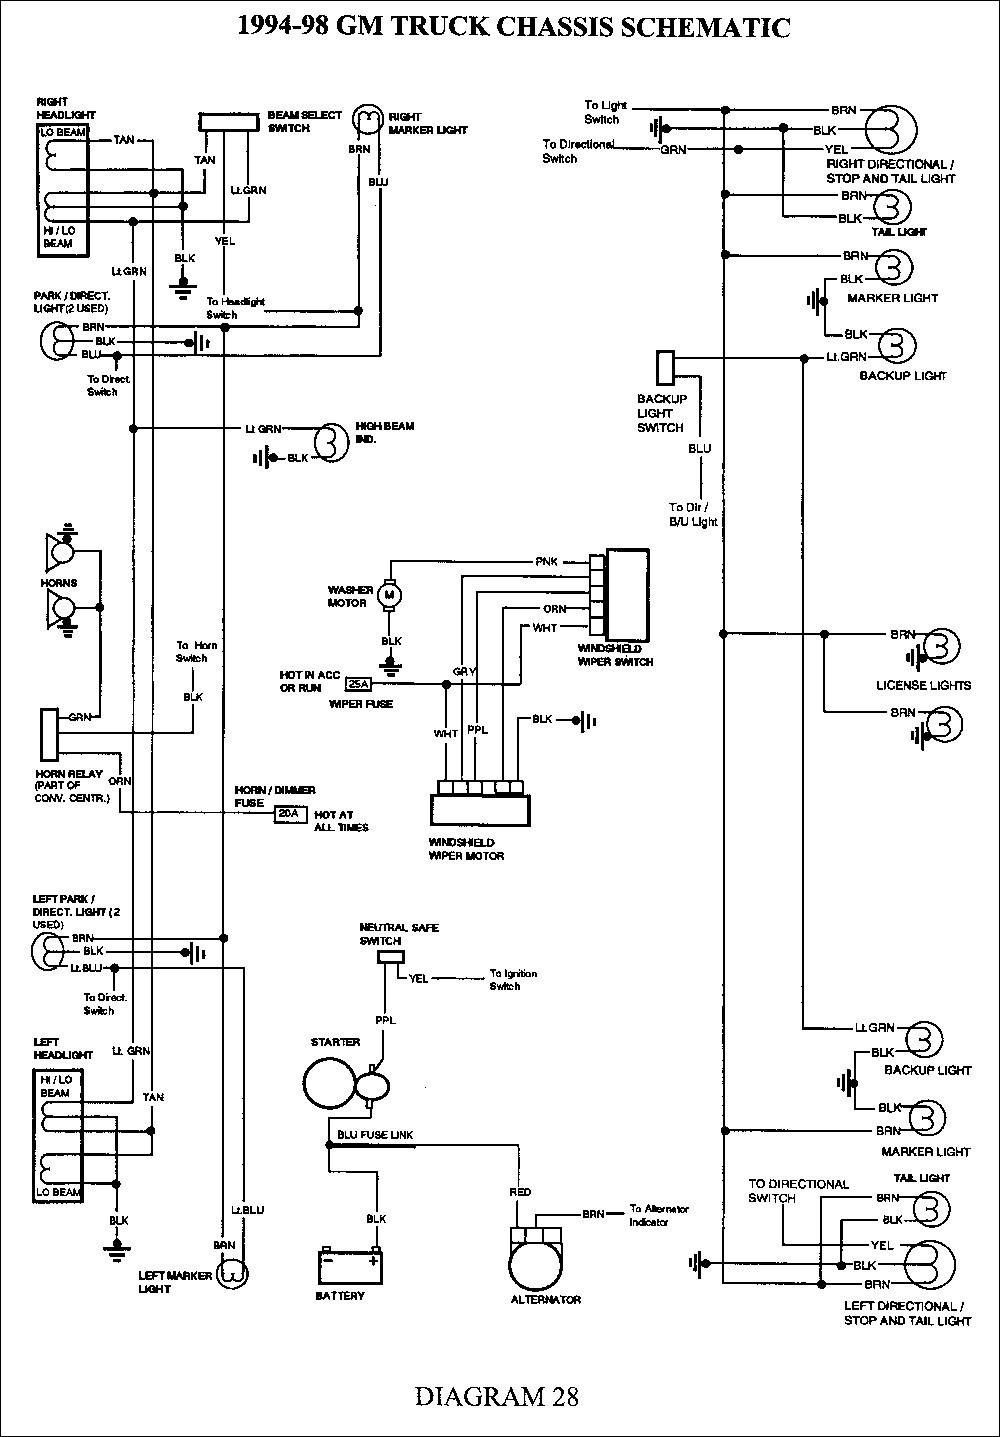 2004 Suburban Trailer Wiring Diagram